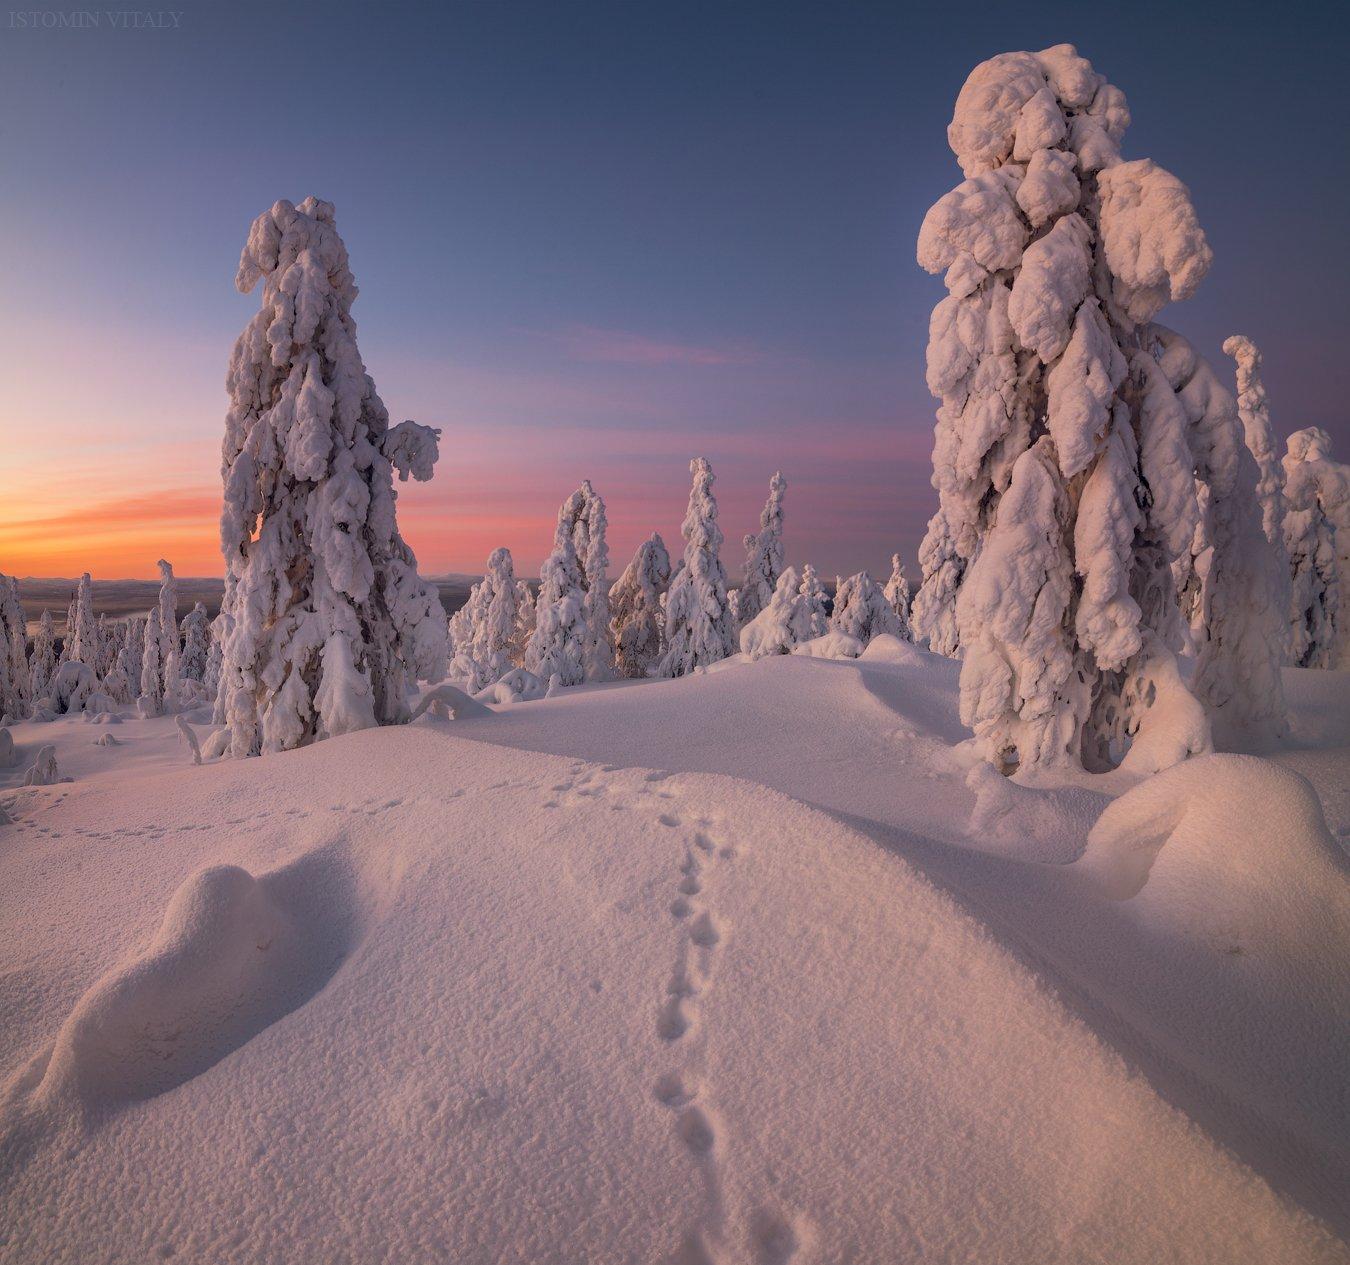 пейзаж,россия,кандалакша,залив,снег,зима,цвет,ночь,цвет,закат, Истомин Виталий